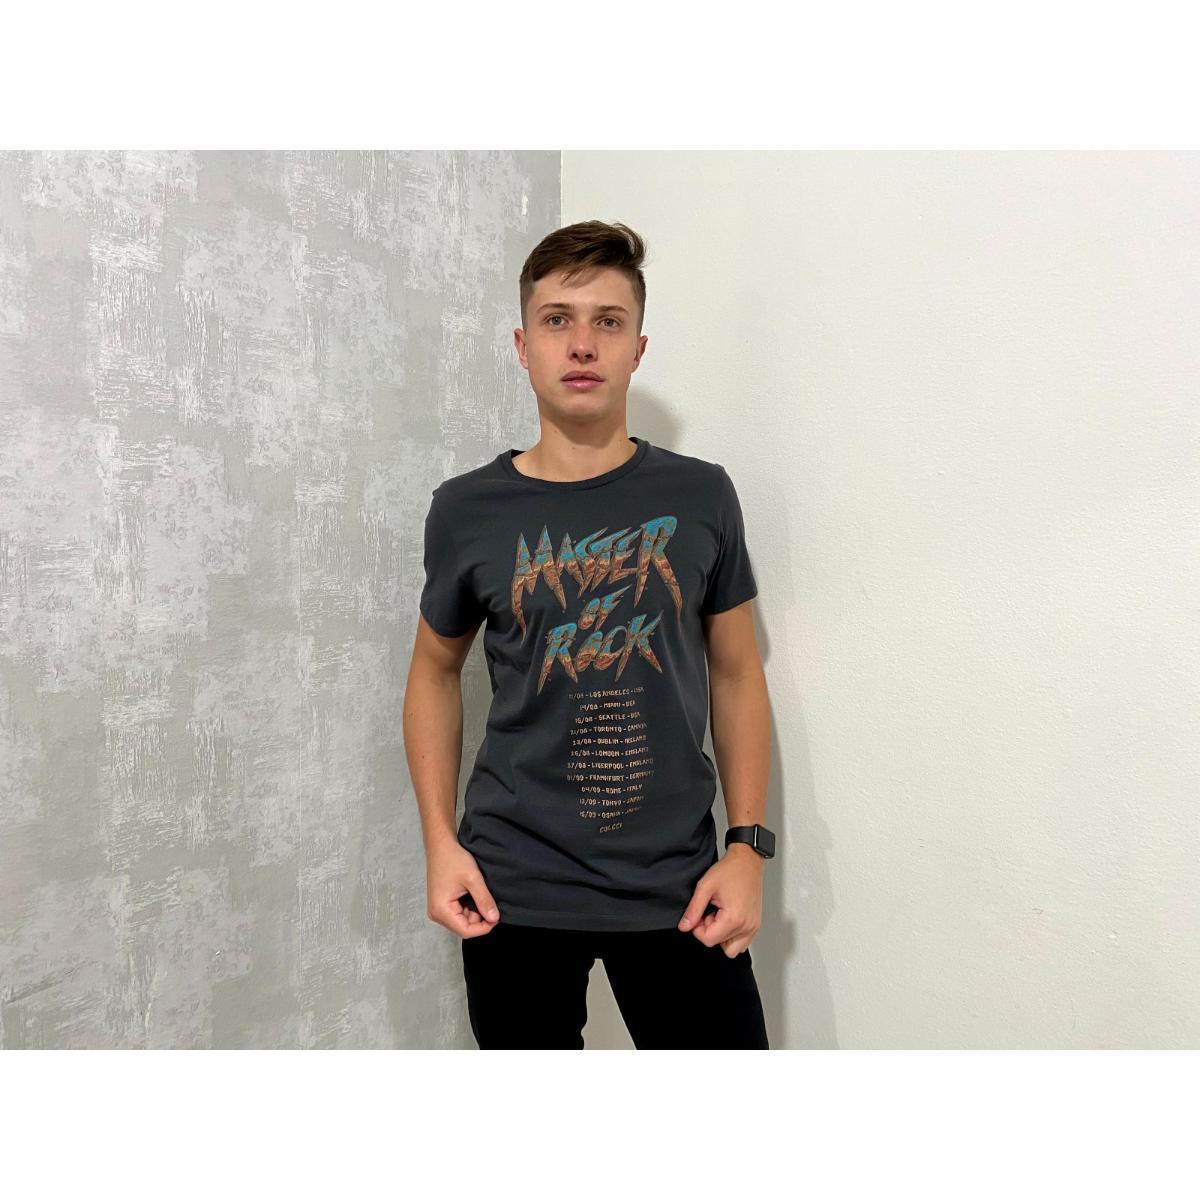 Camiseta Masculina Colcci 350108489 050 Preto